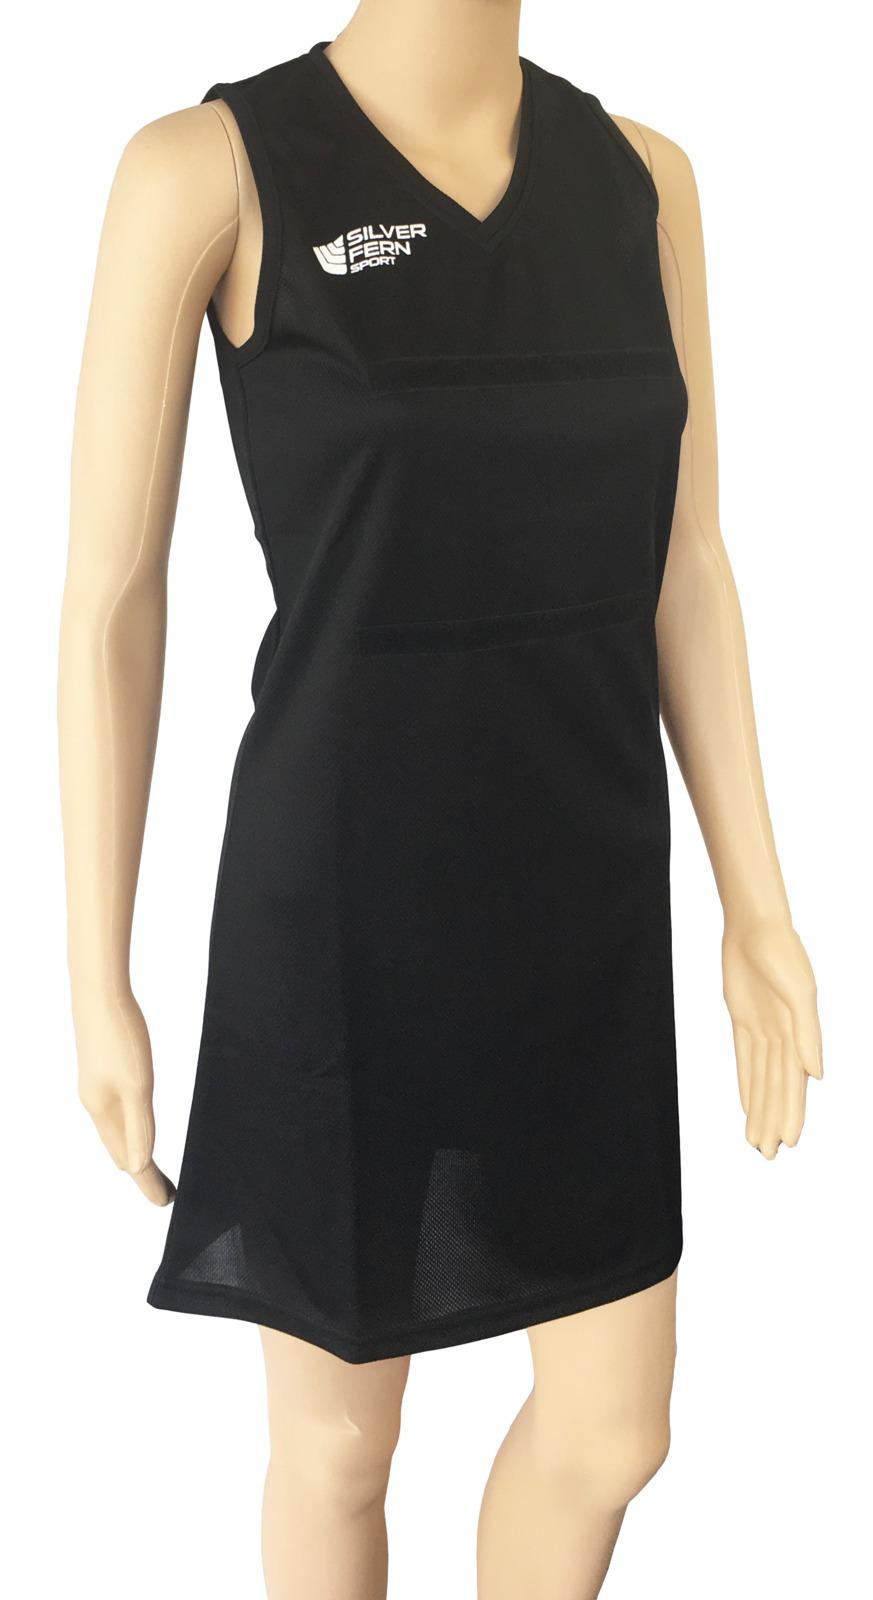 Silver Fern - Netball Dress image